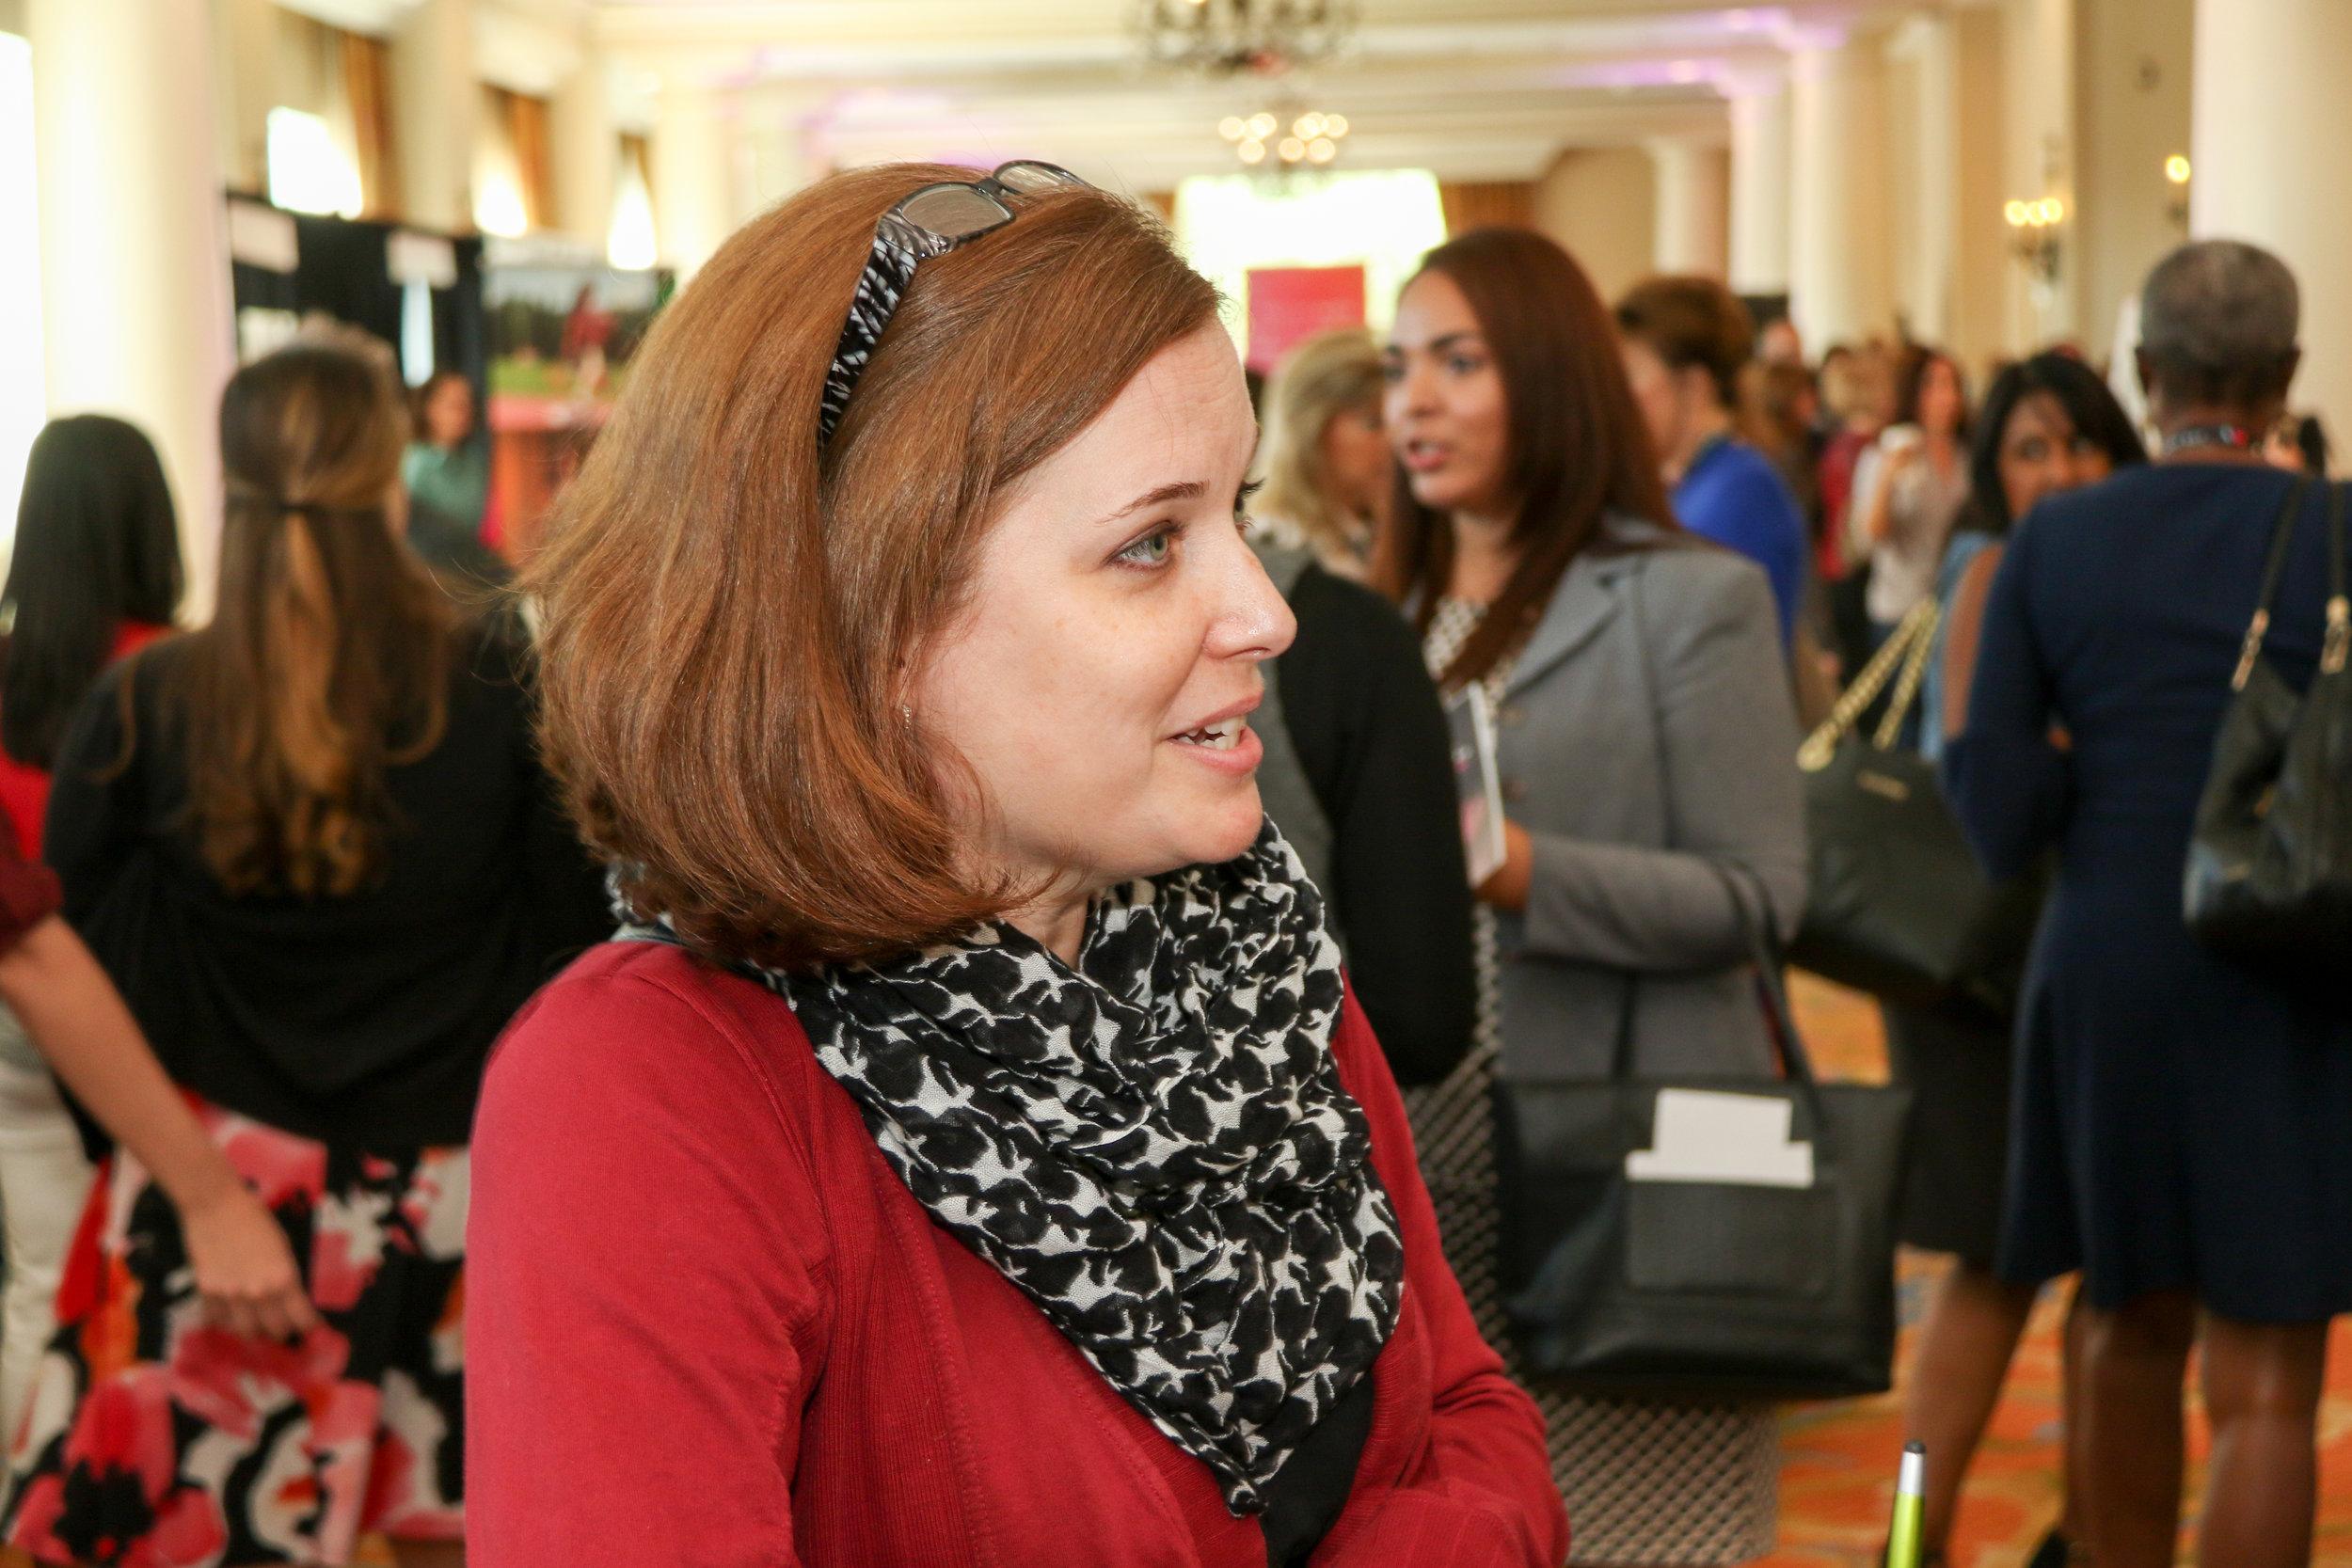 567_WomensConference_10-27-17.jpg